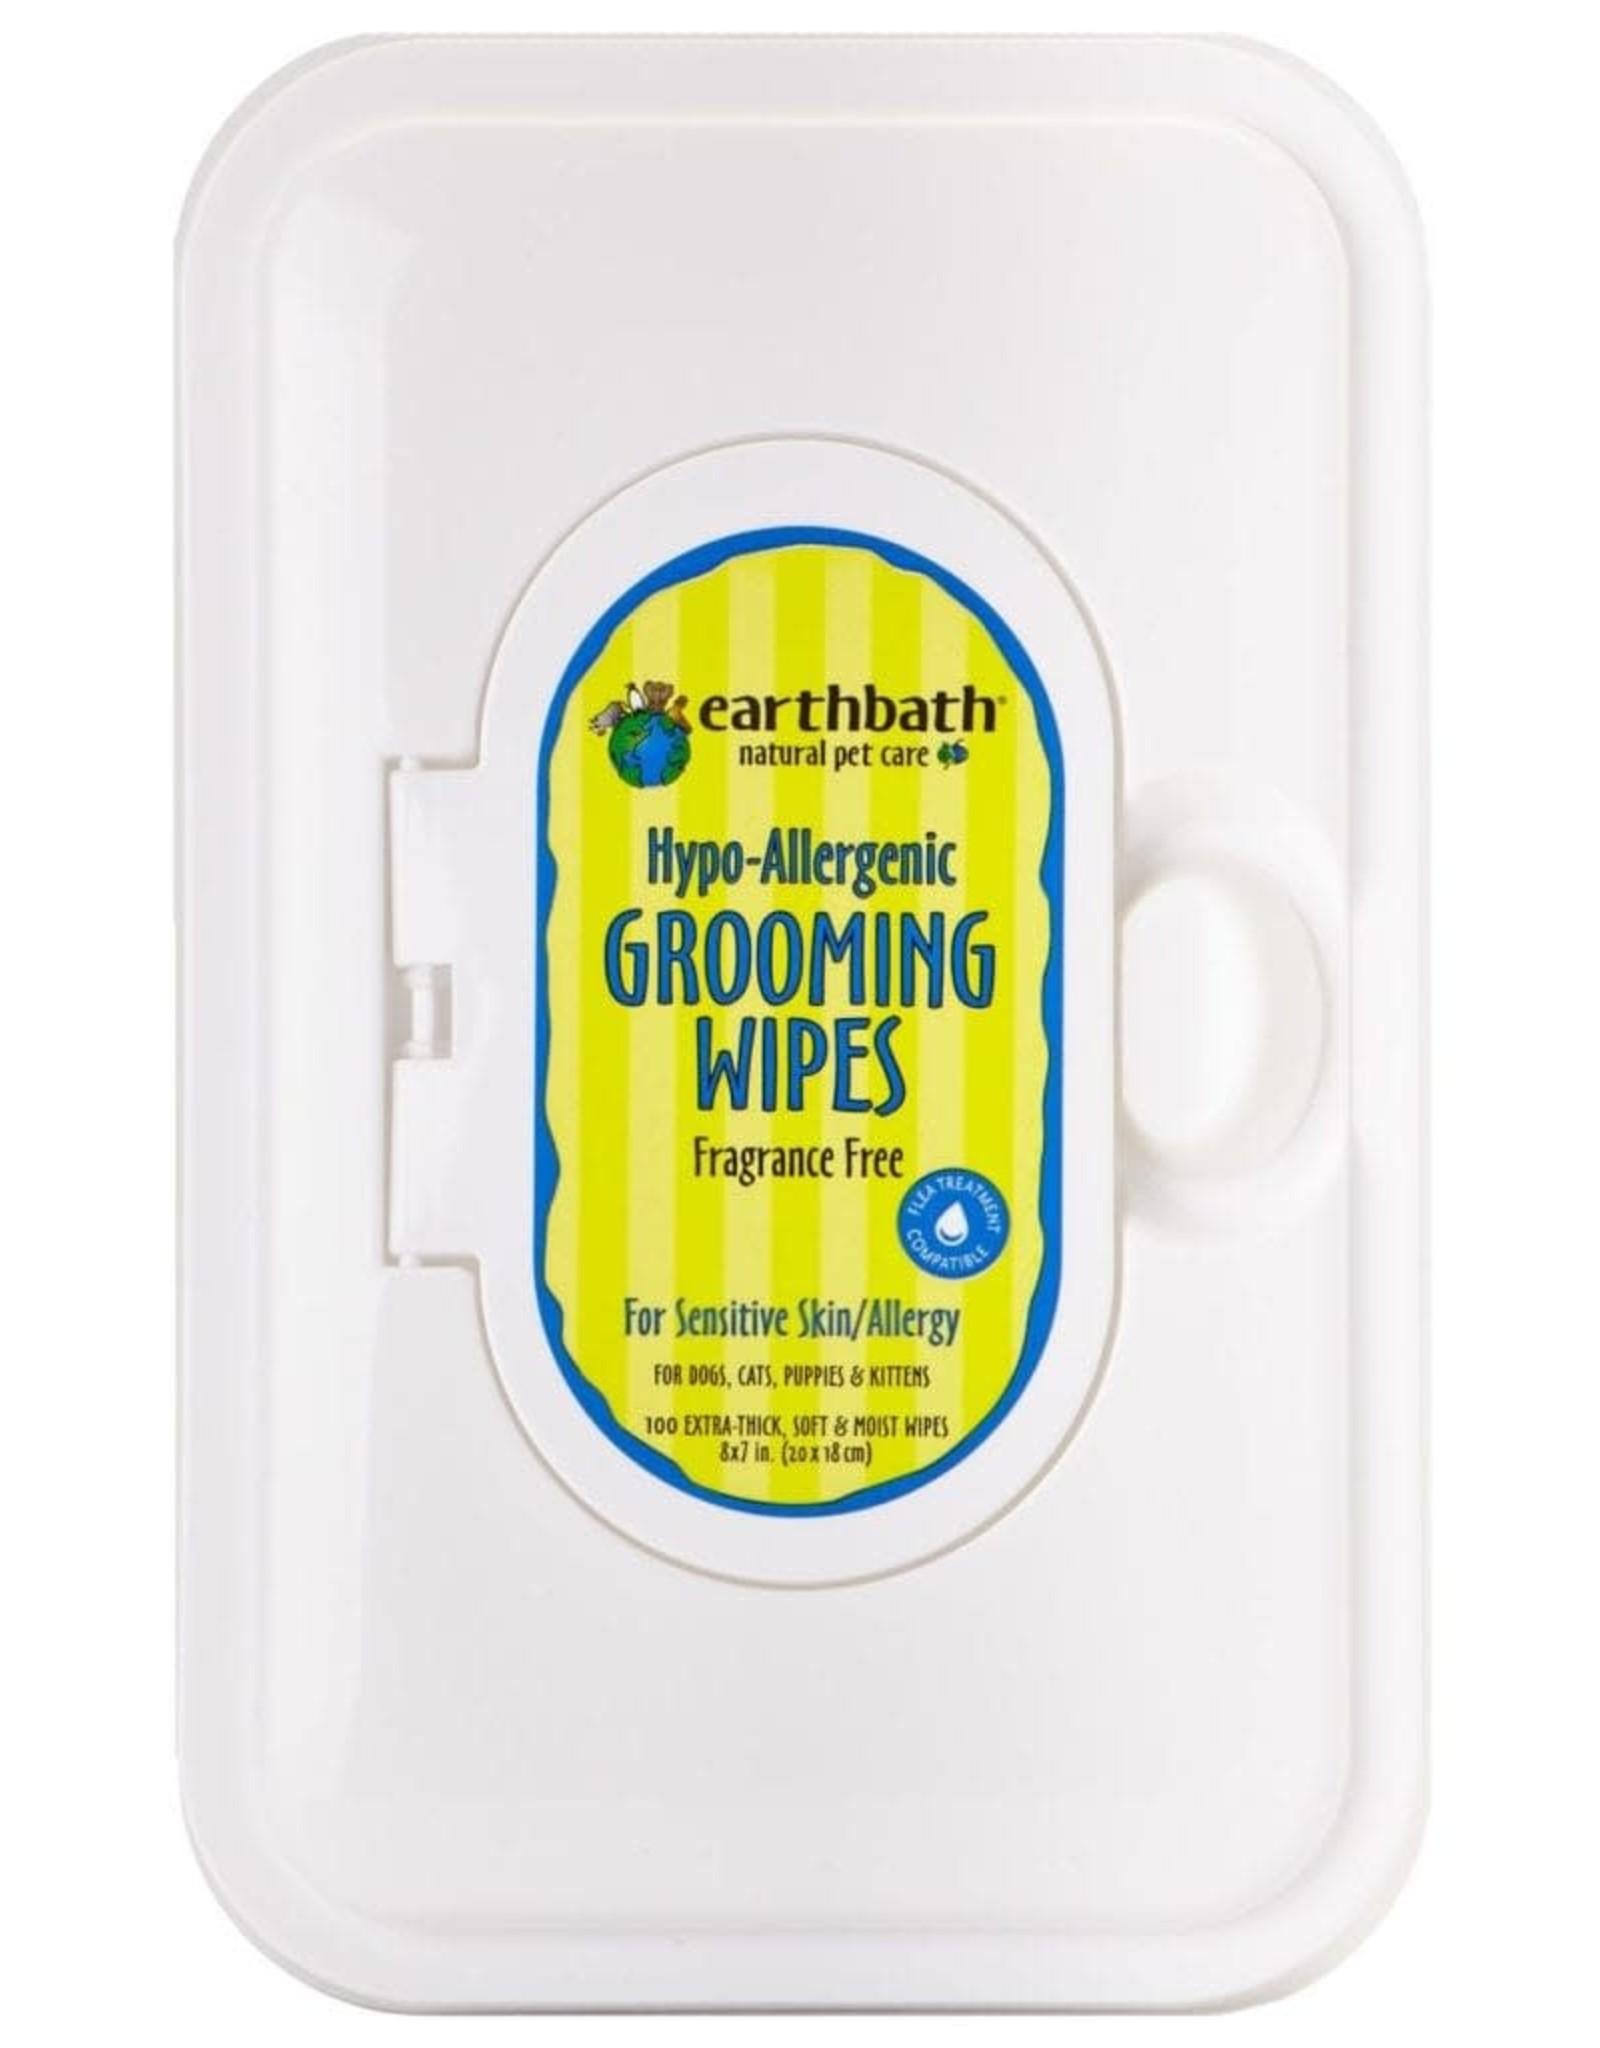 Earthbath EARTHBATH Grooming Wipes HypoAllergenic